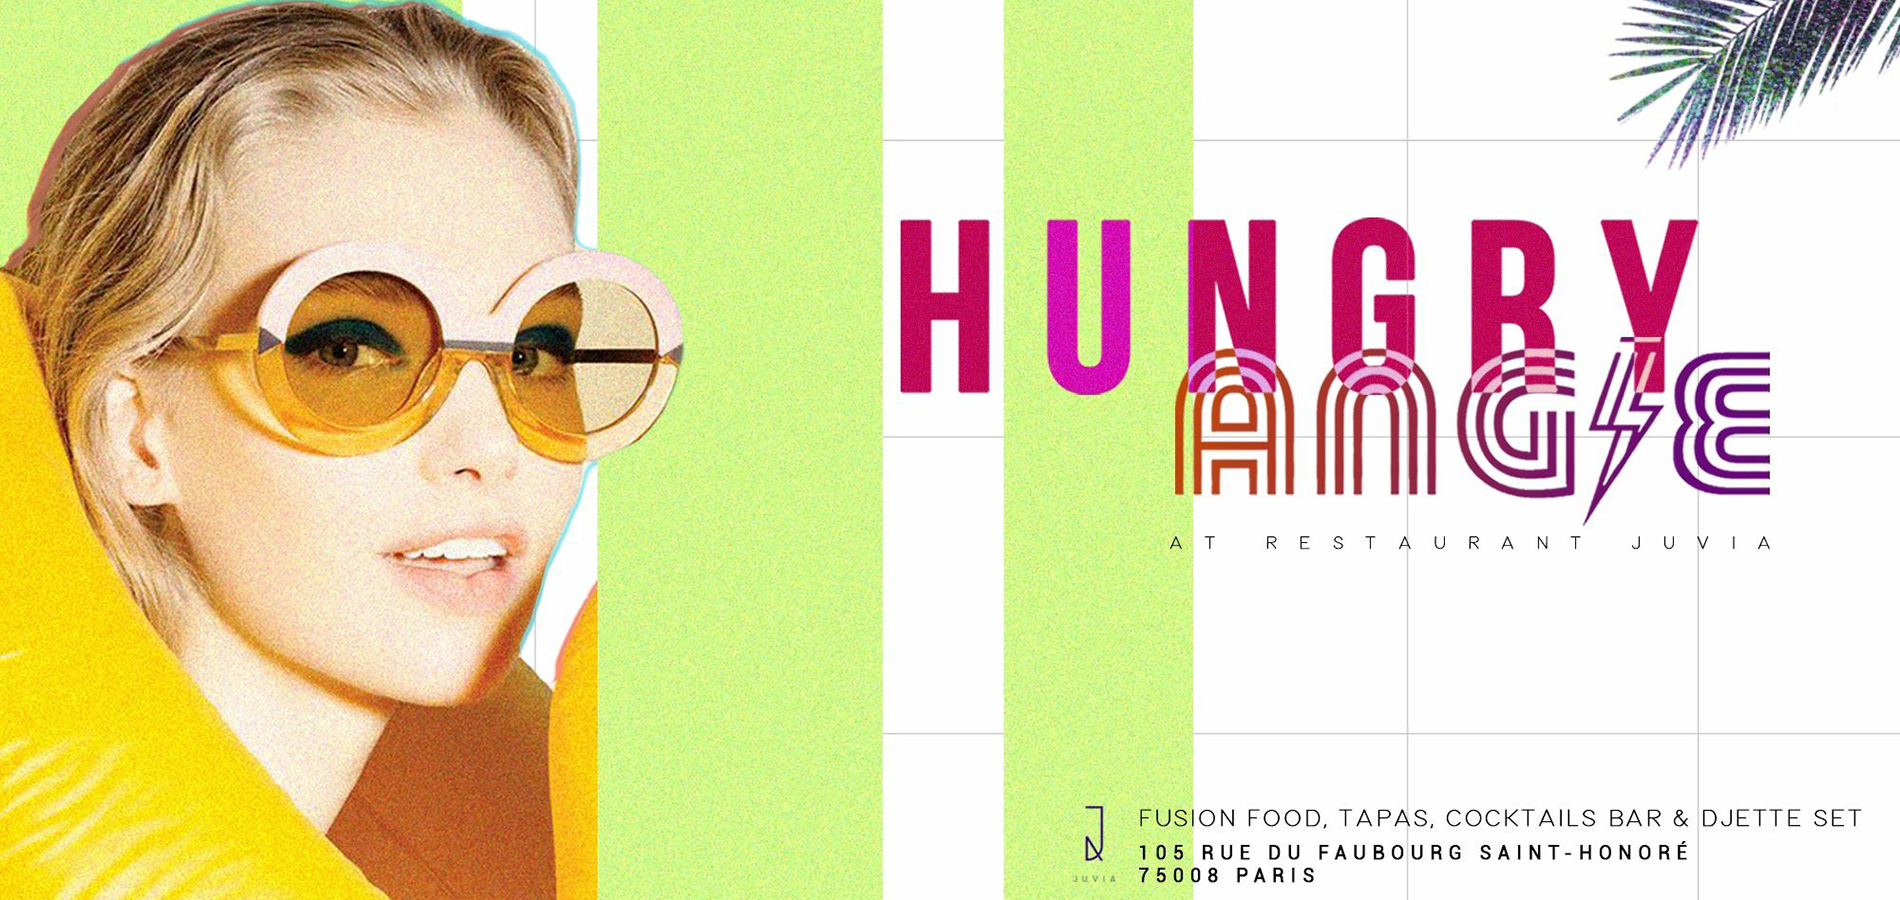 Hungry Angie at Juvia